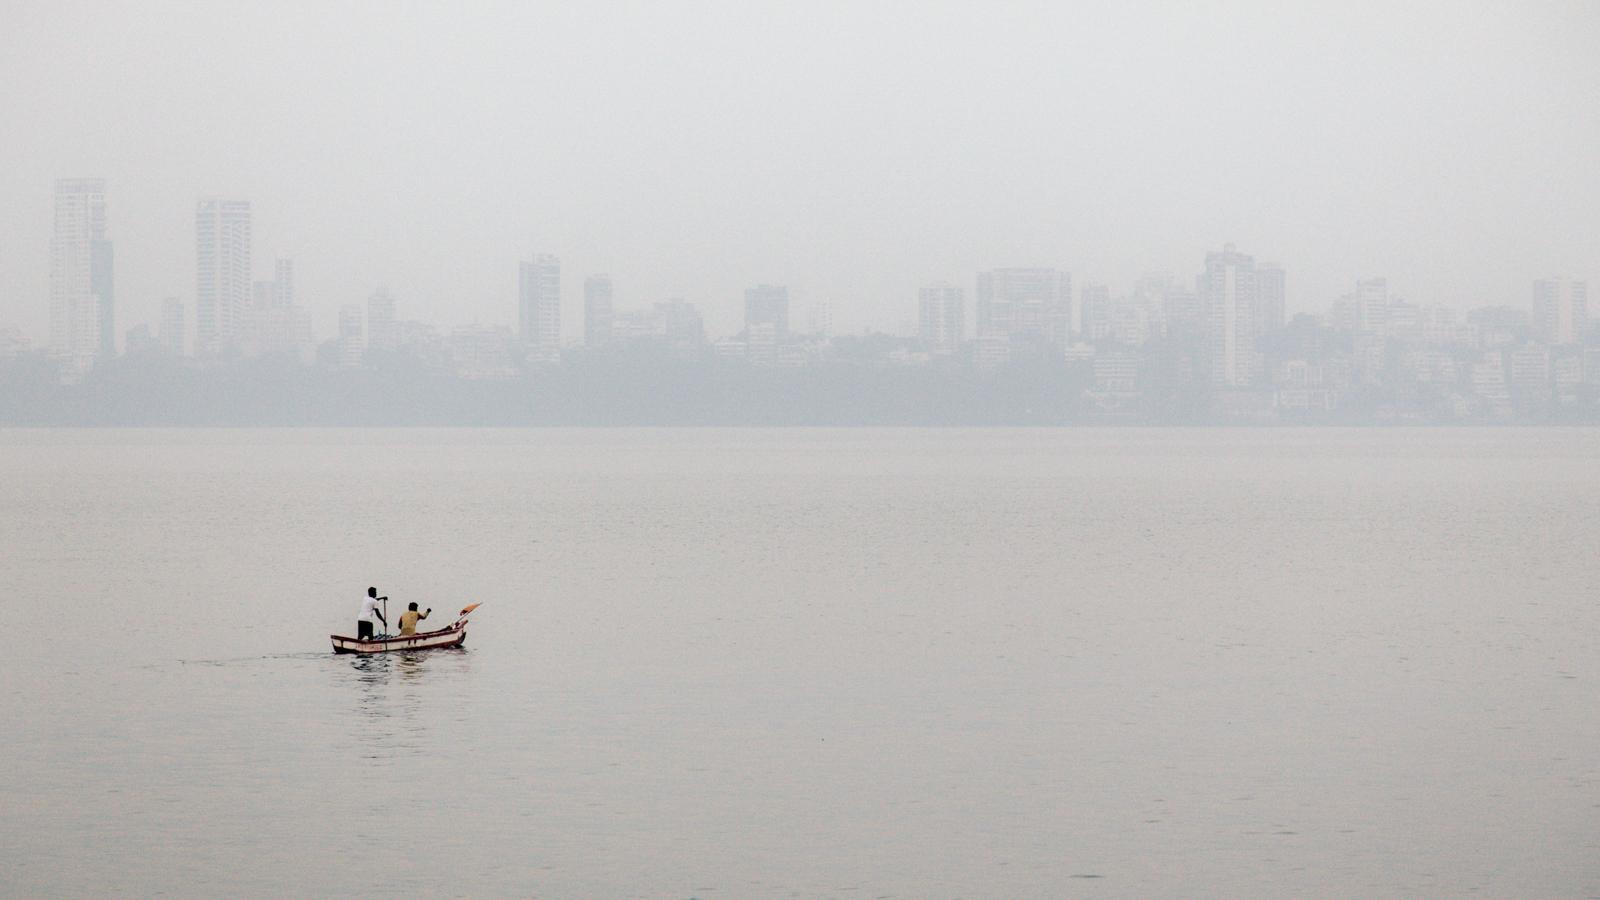 Skiff - Mumbai, India - 2014